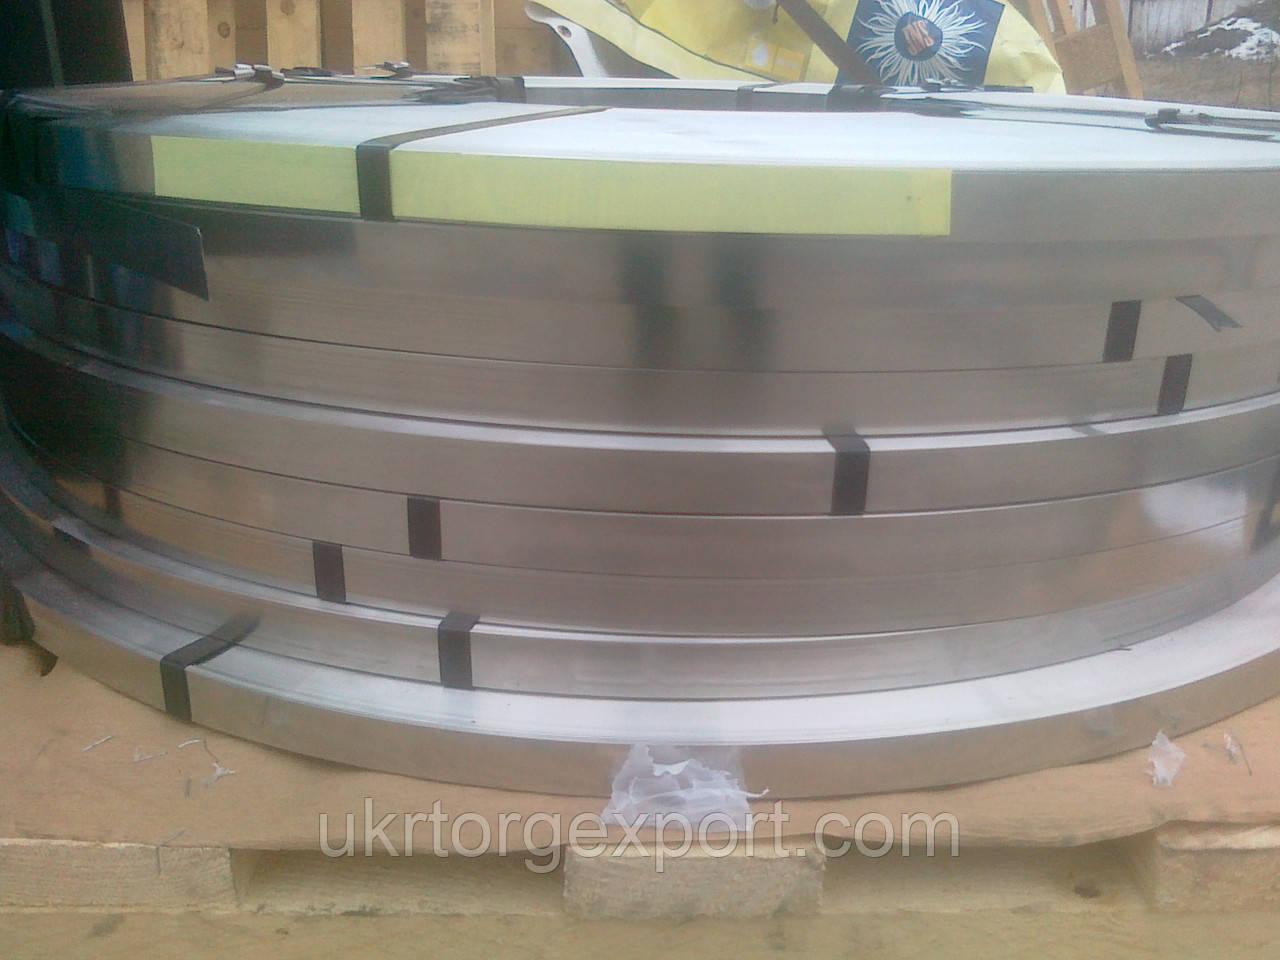 Лента фехраль Х23Ю5Т (OCr23Al5) 0,15*2,25 мм